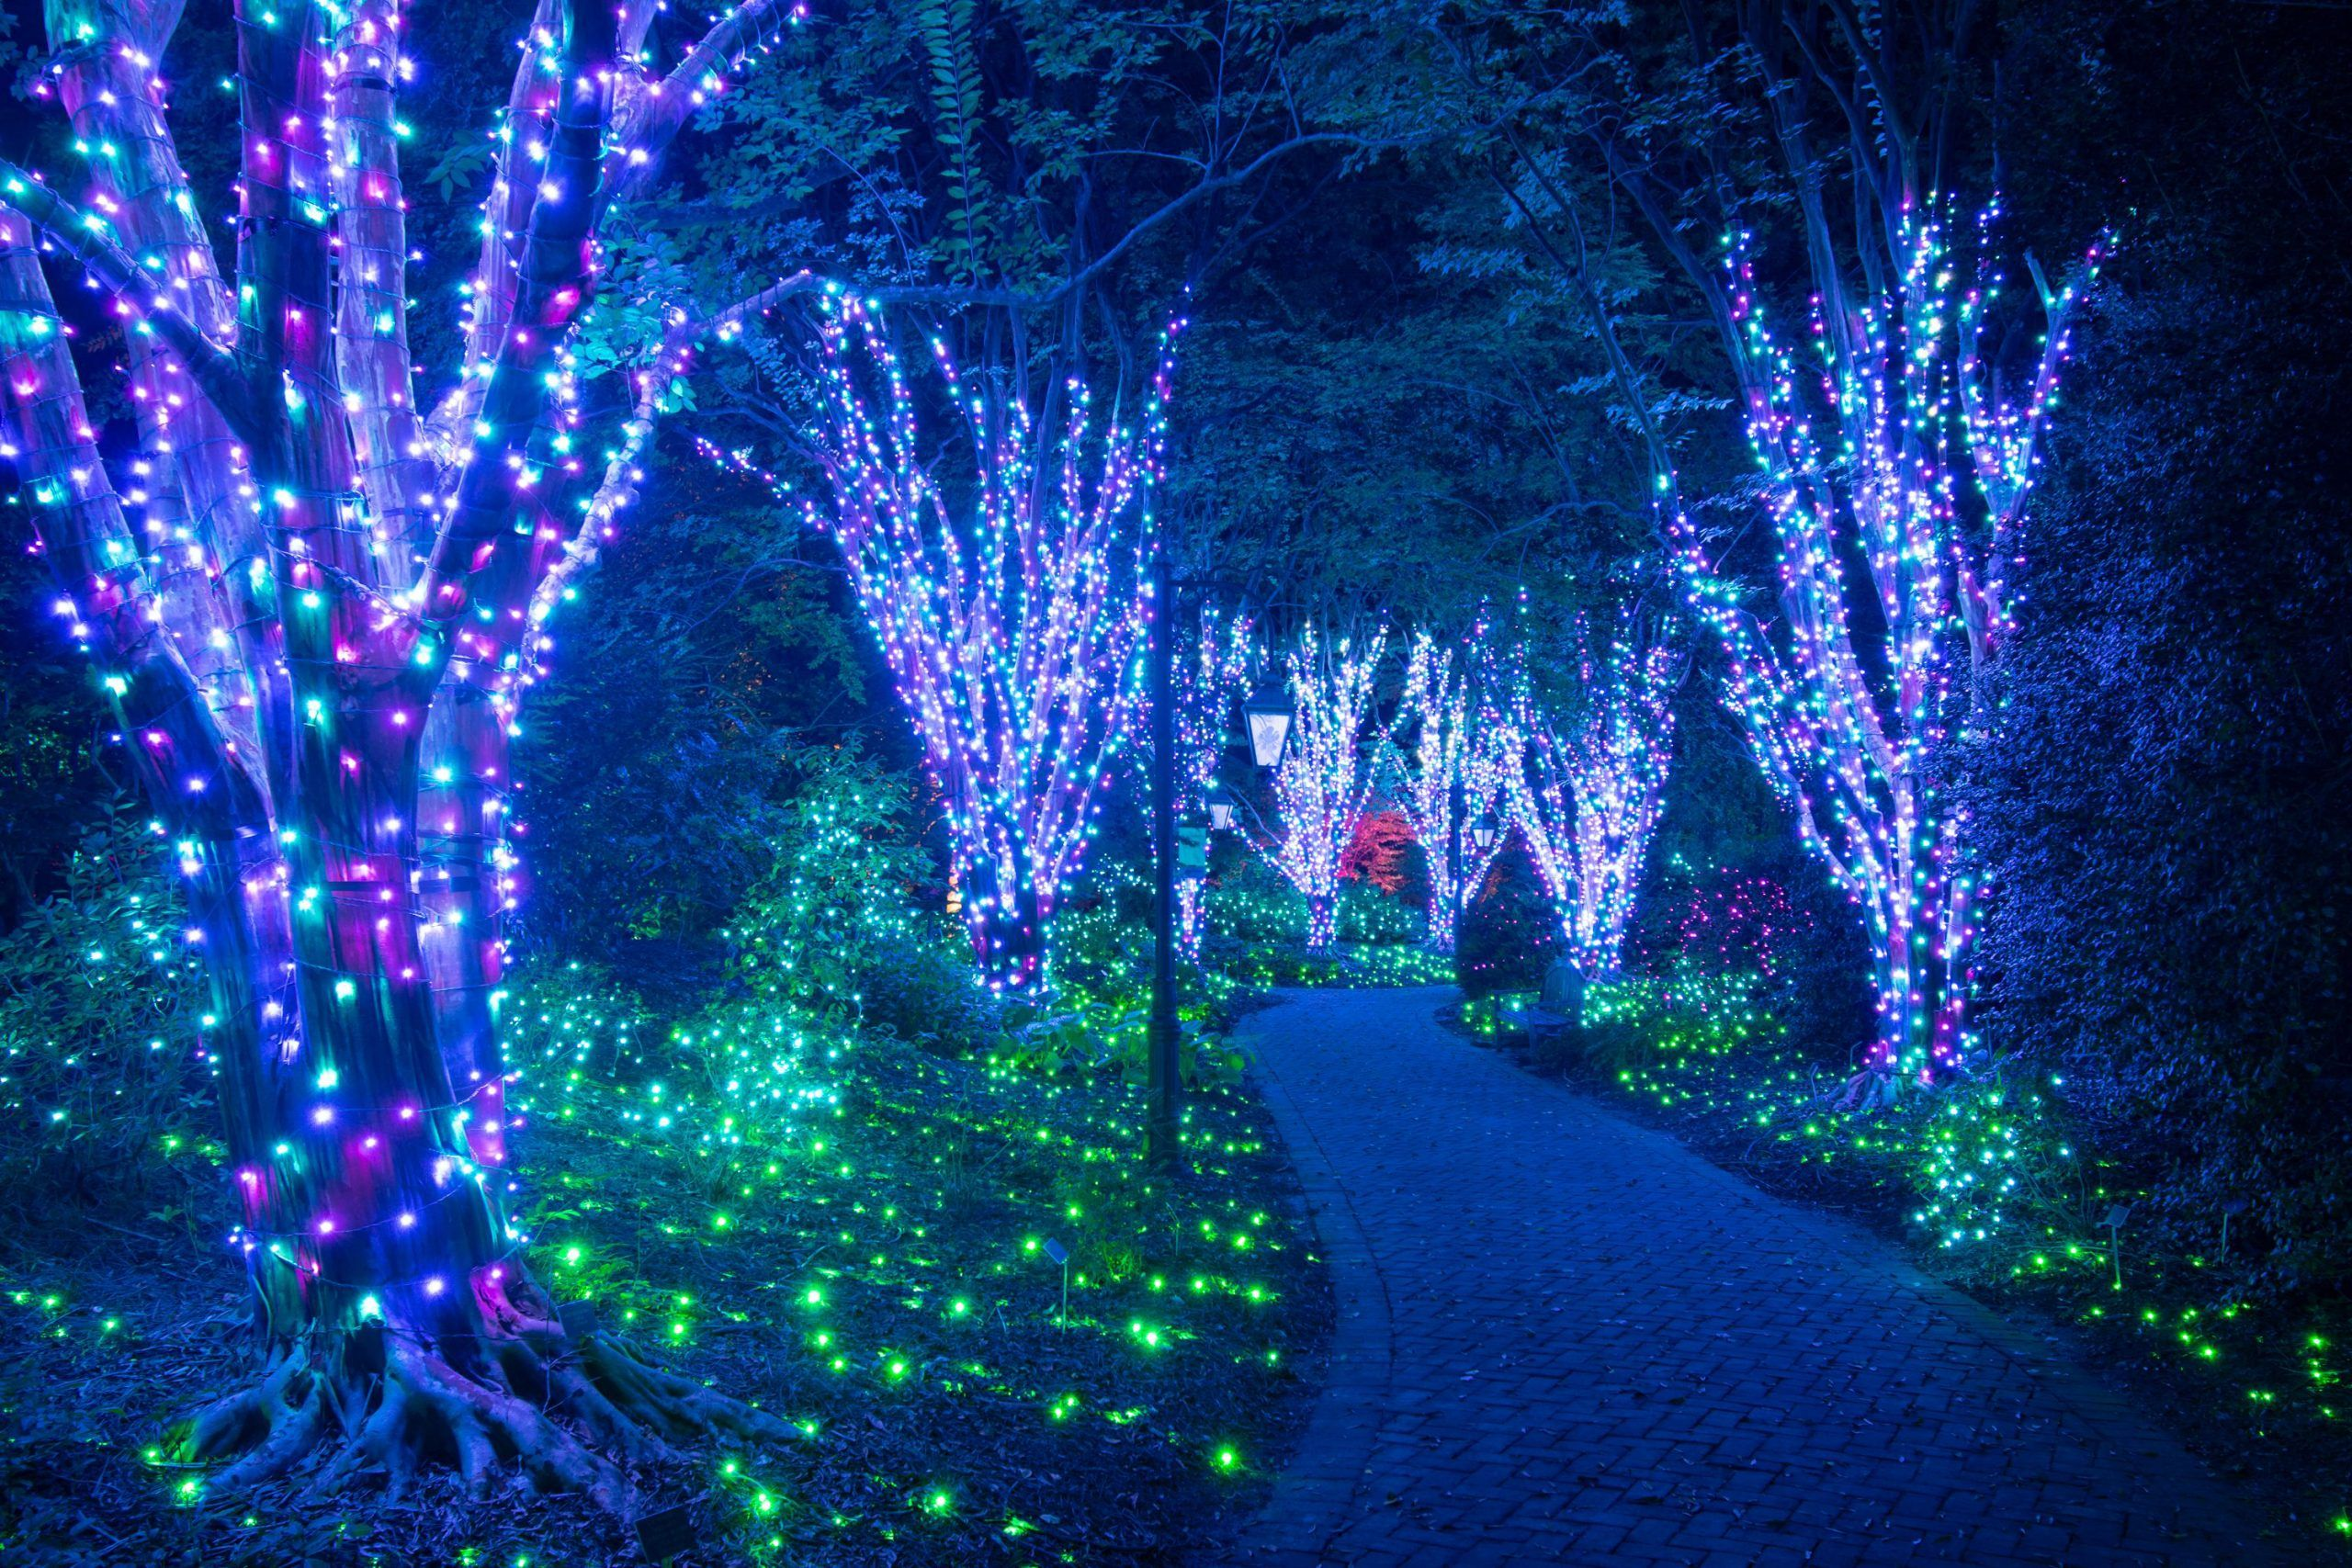 b10018299224e67d622b47cd9112026c - Lights At Botanical Gardens St Louis